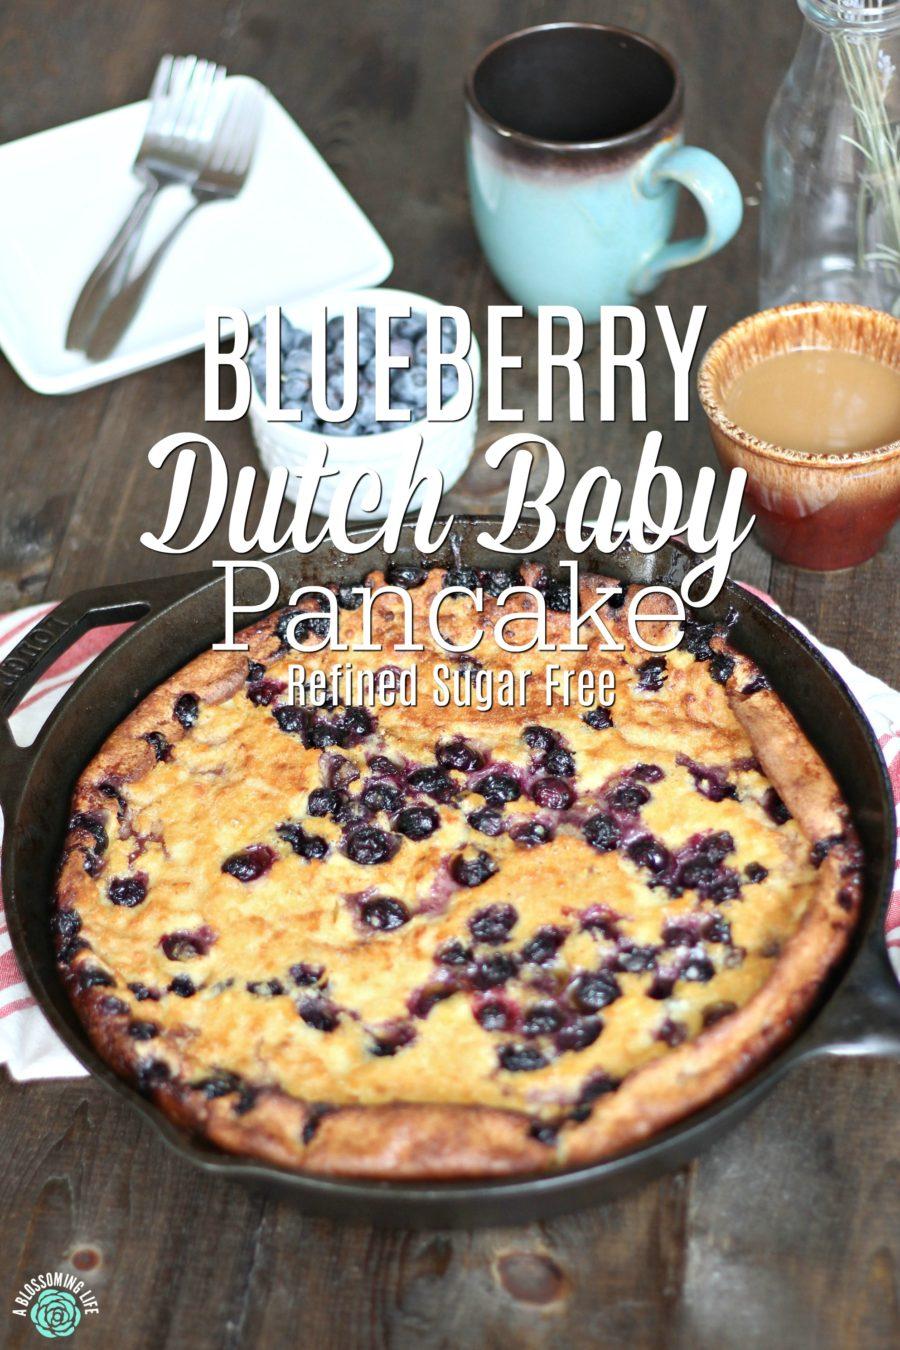 Blueberry Dutch Baby Recipe